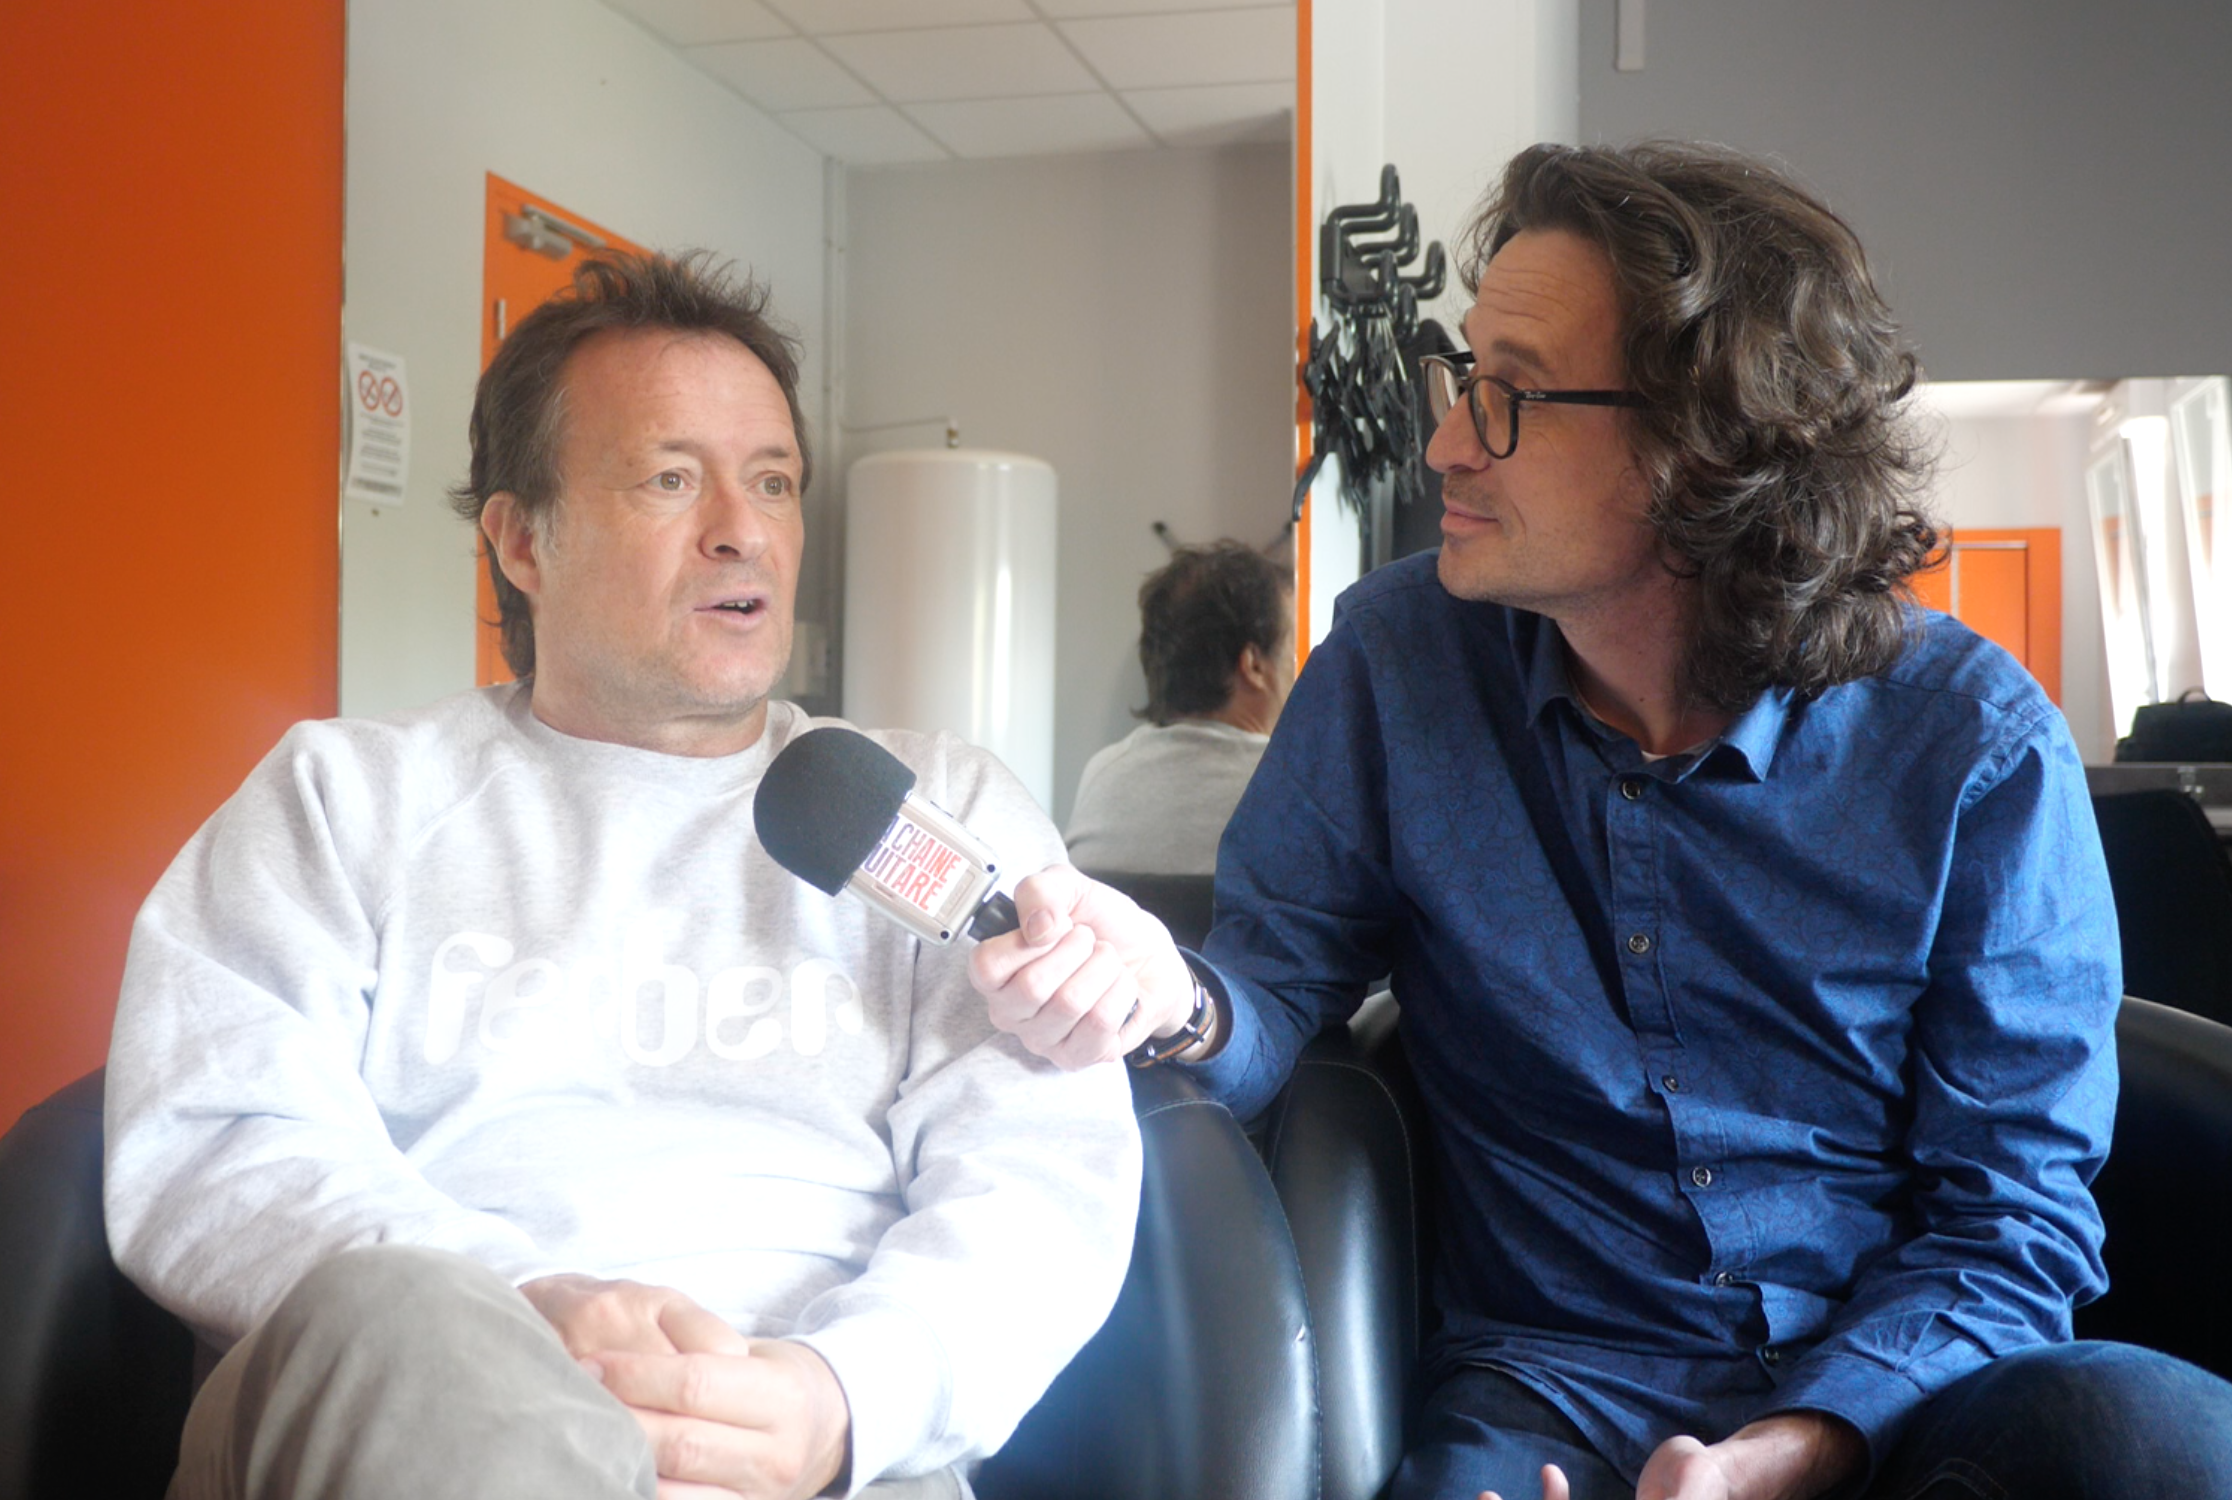 Laurent Vernerey interview express du bassiste, cador de la basse Precision